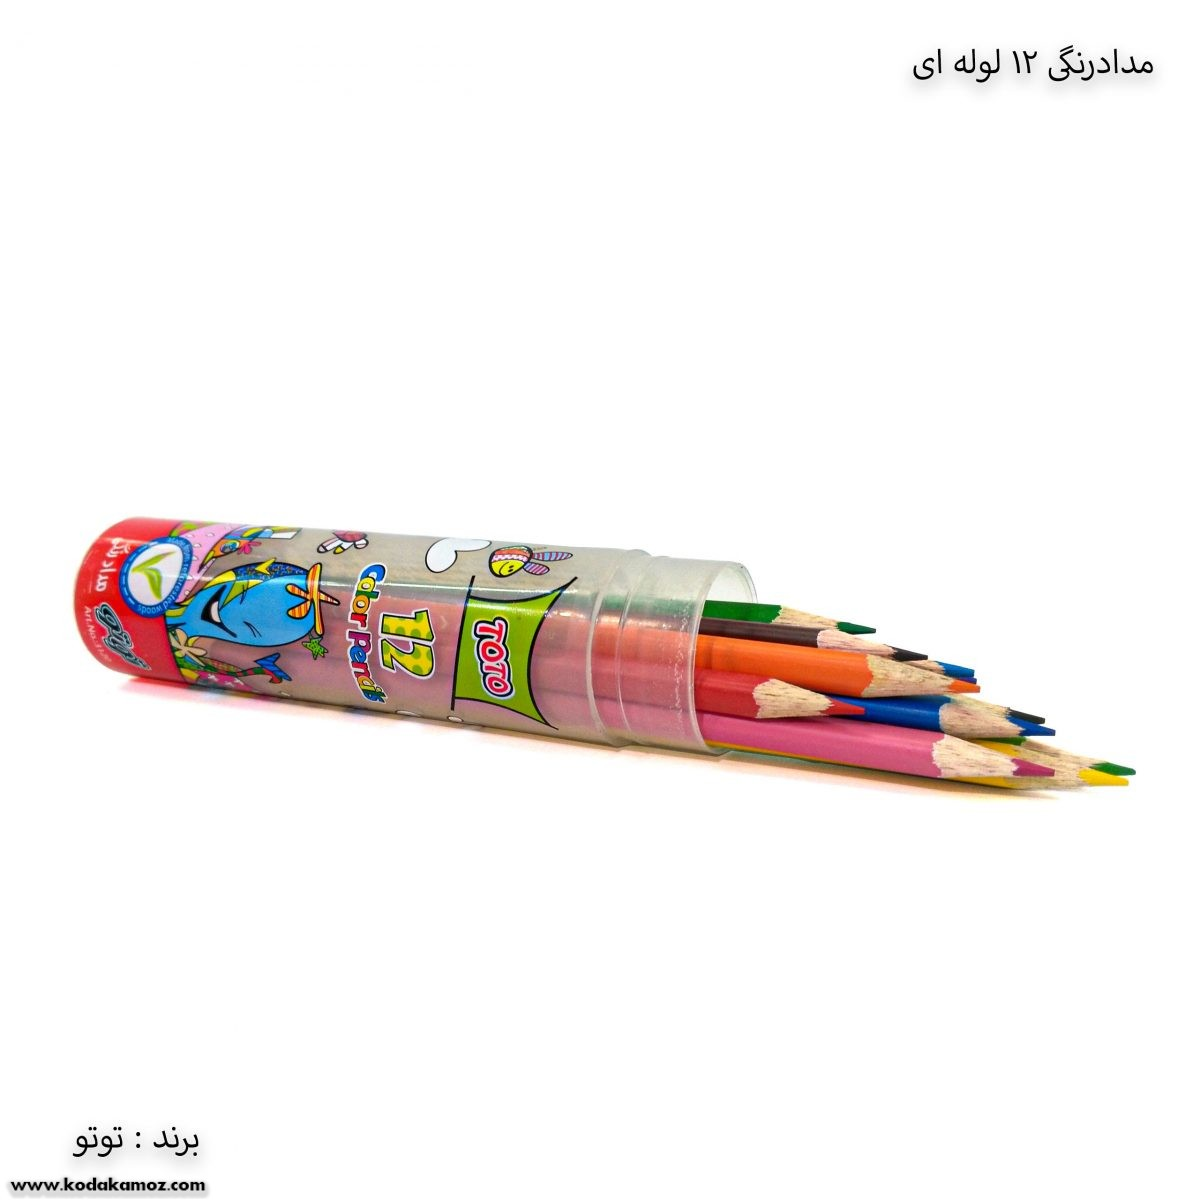 مداد رنگی 12 لوله ای توتو 1